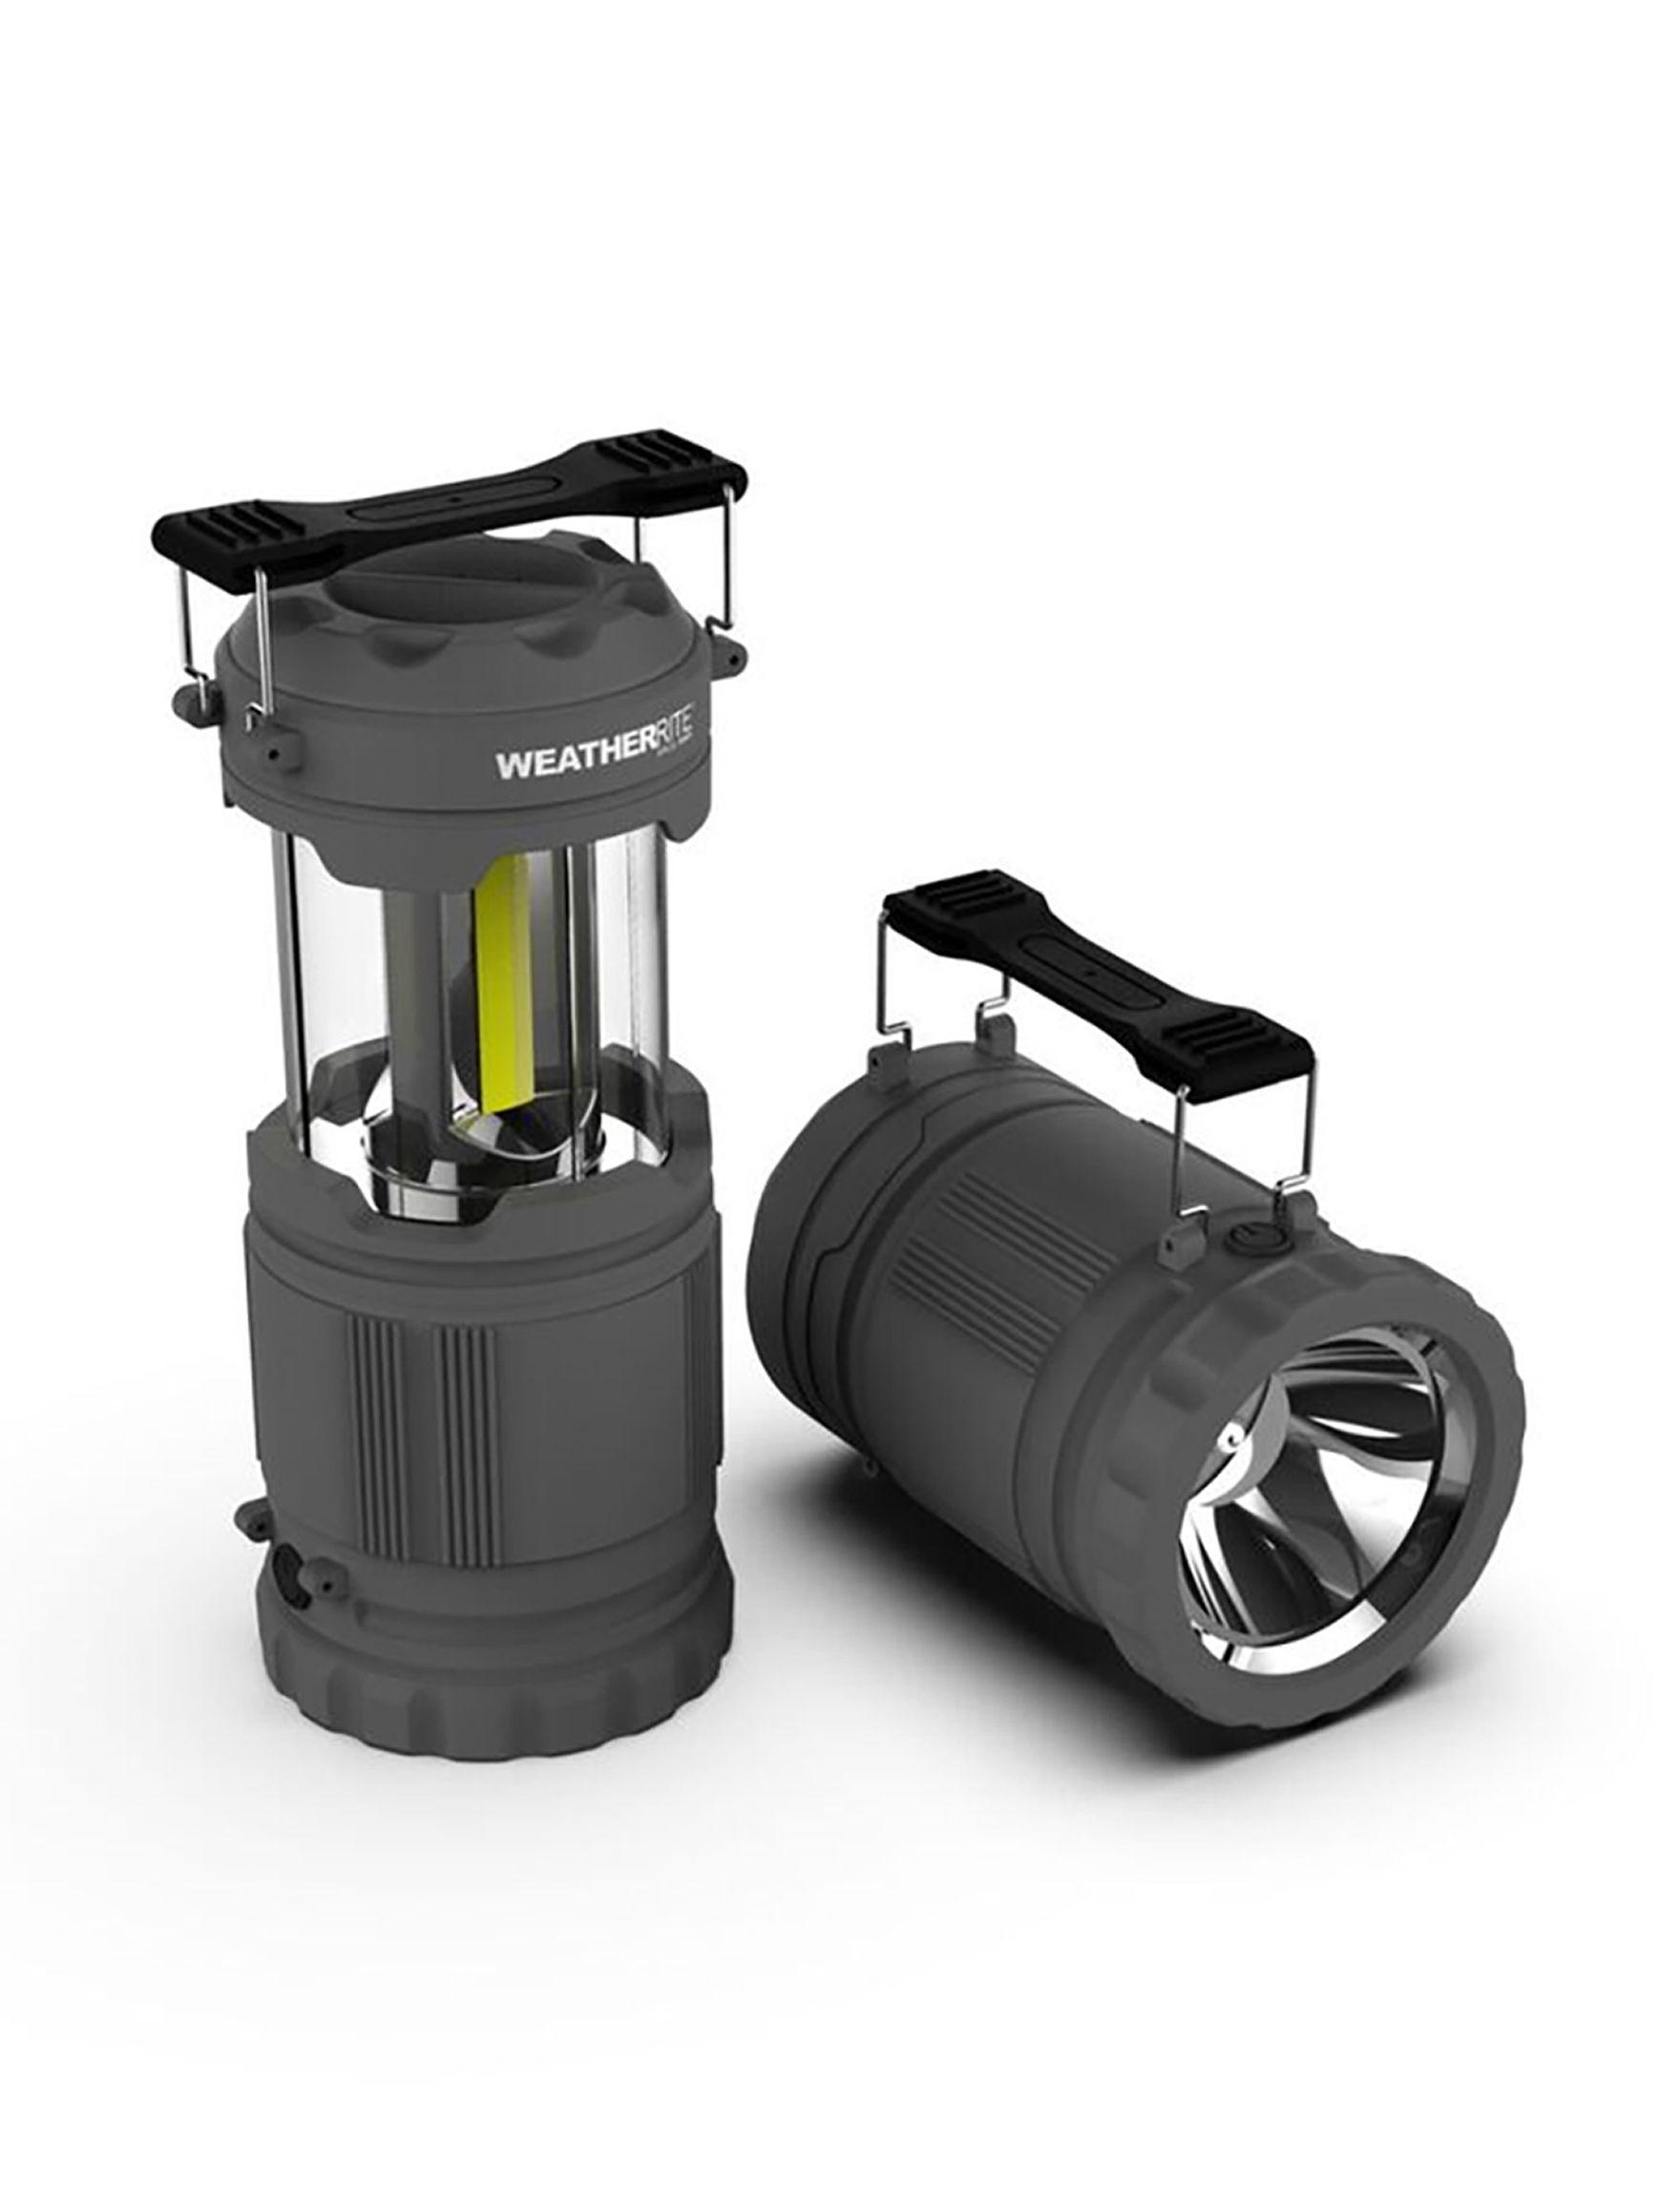 Weatherrite Black Lights & Lanterns Camping & Outdoor Gear Tools Travel Accessories